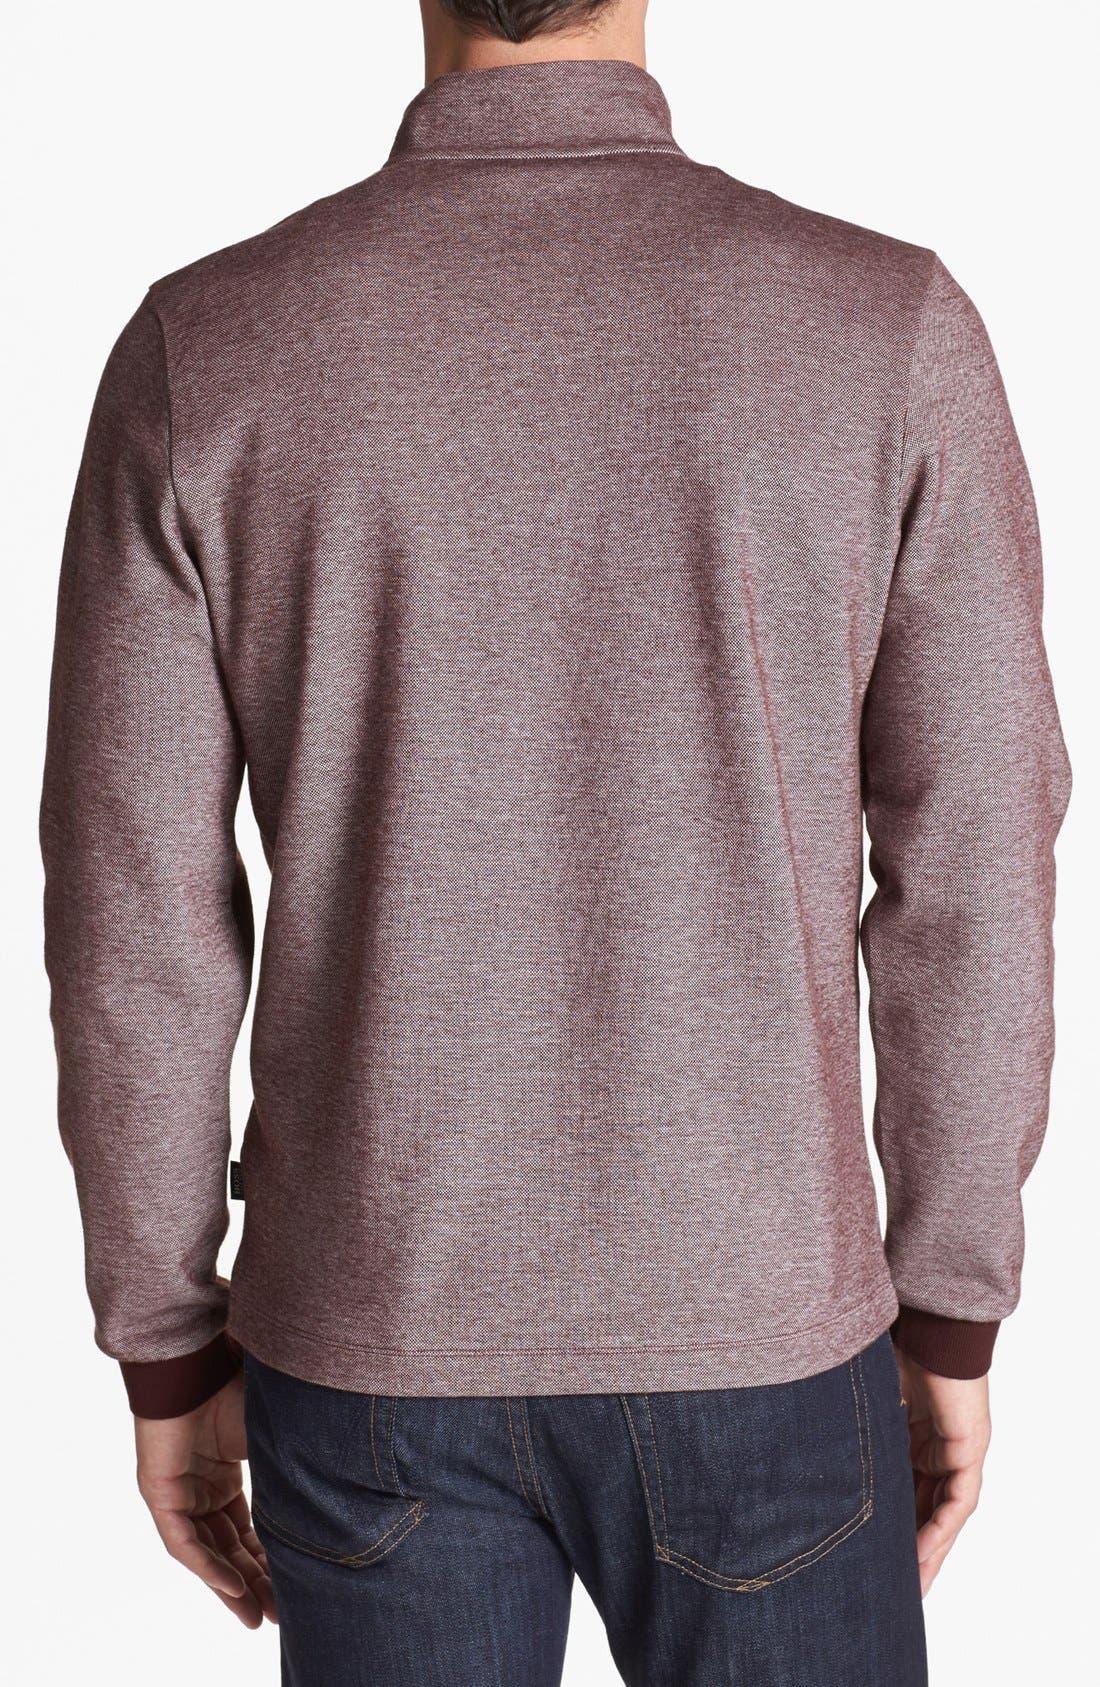 Alternate Image 2  - BOSS HUGO BOSS 'Piceno' Mock Neck Sweatshirt